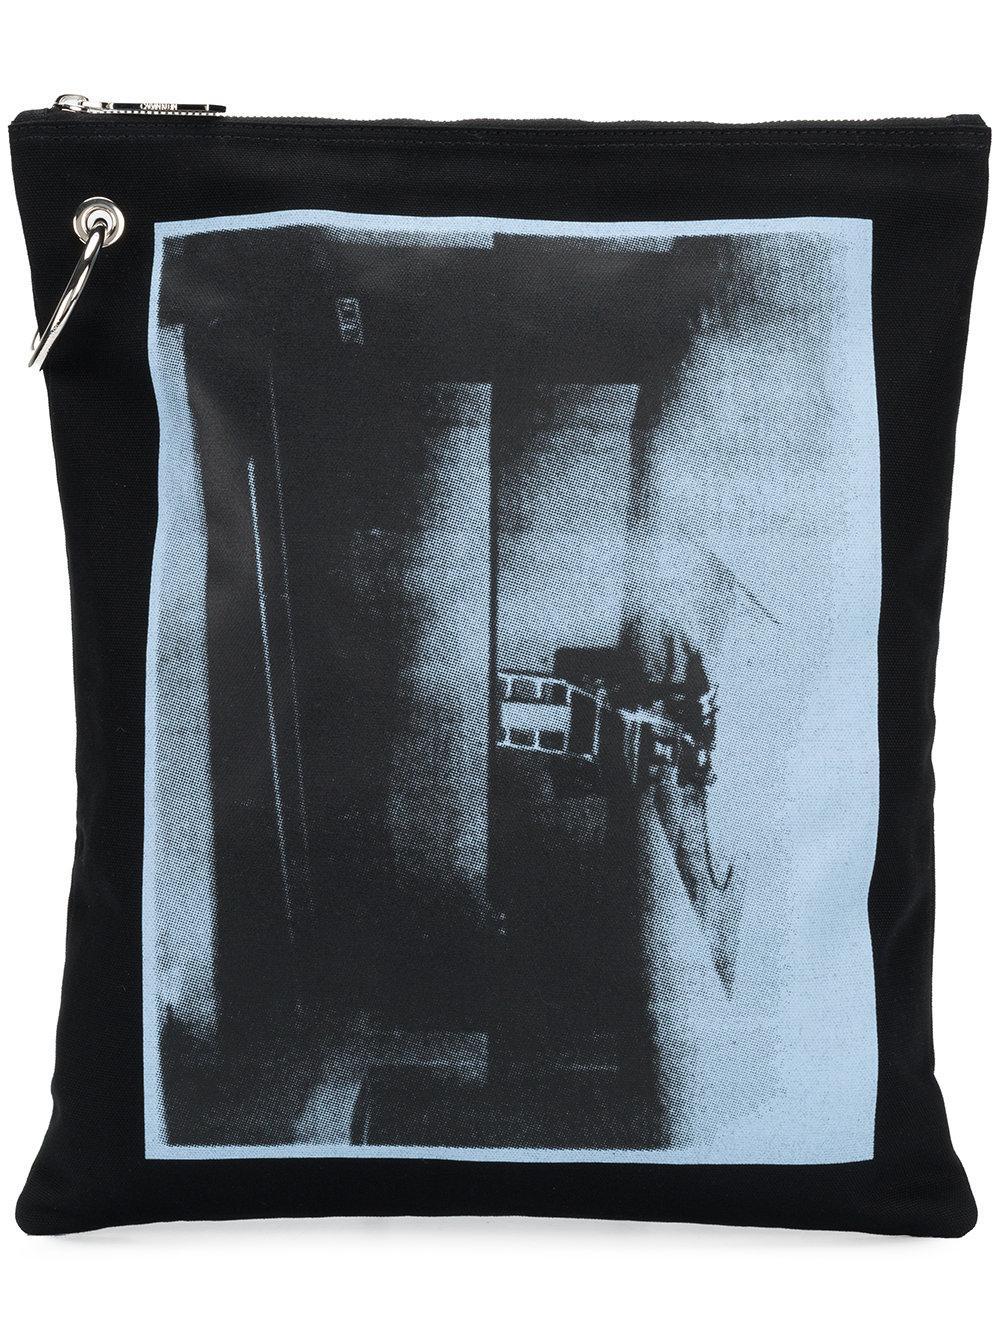 Calvin Klein 205w39nyc X Andy Warhol Foundation Little Electric Chair Clutch Bag